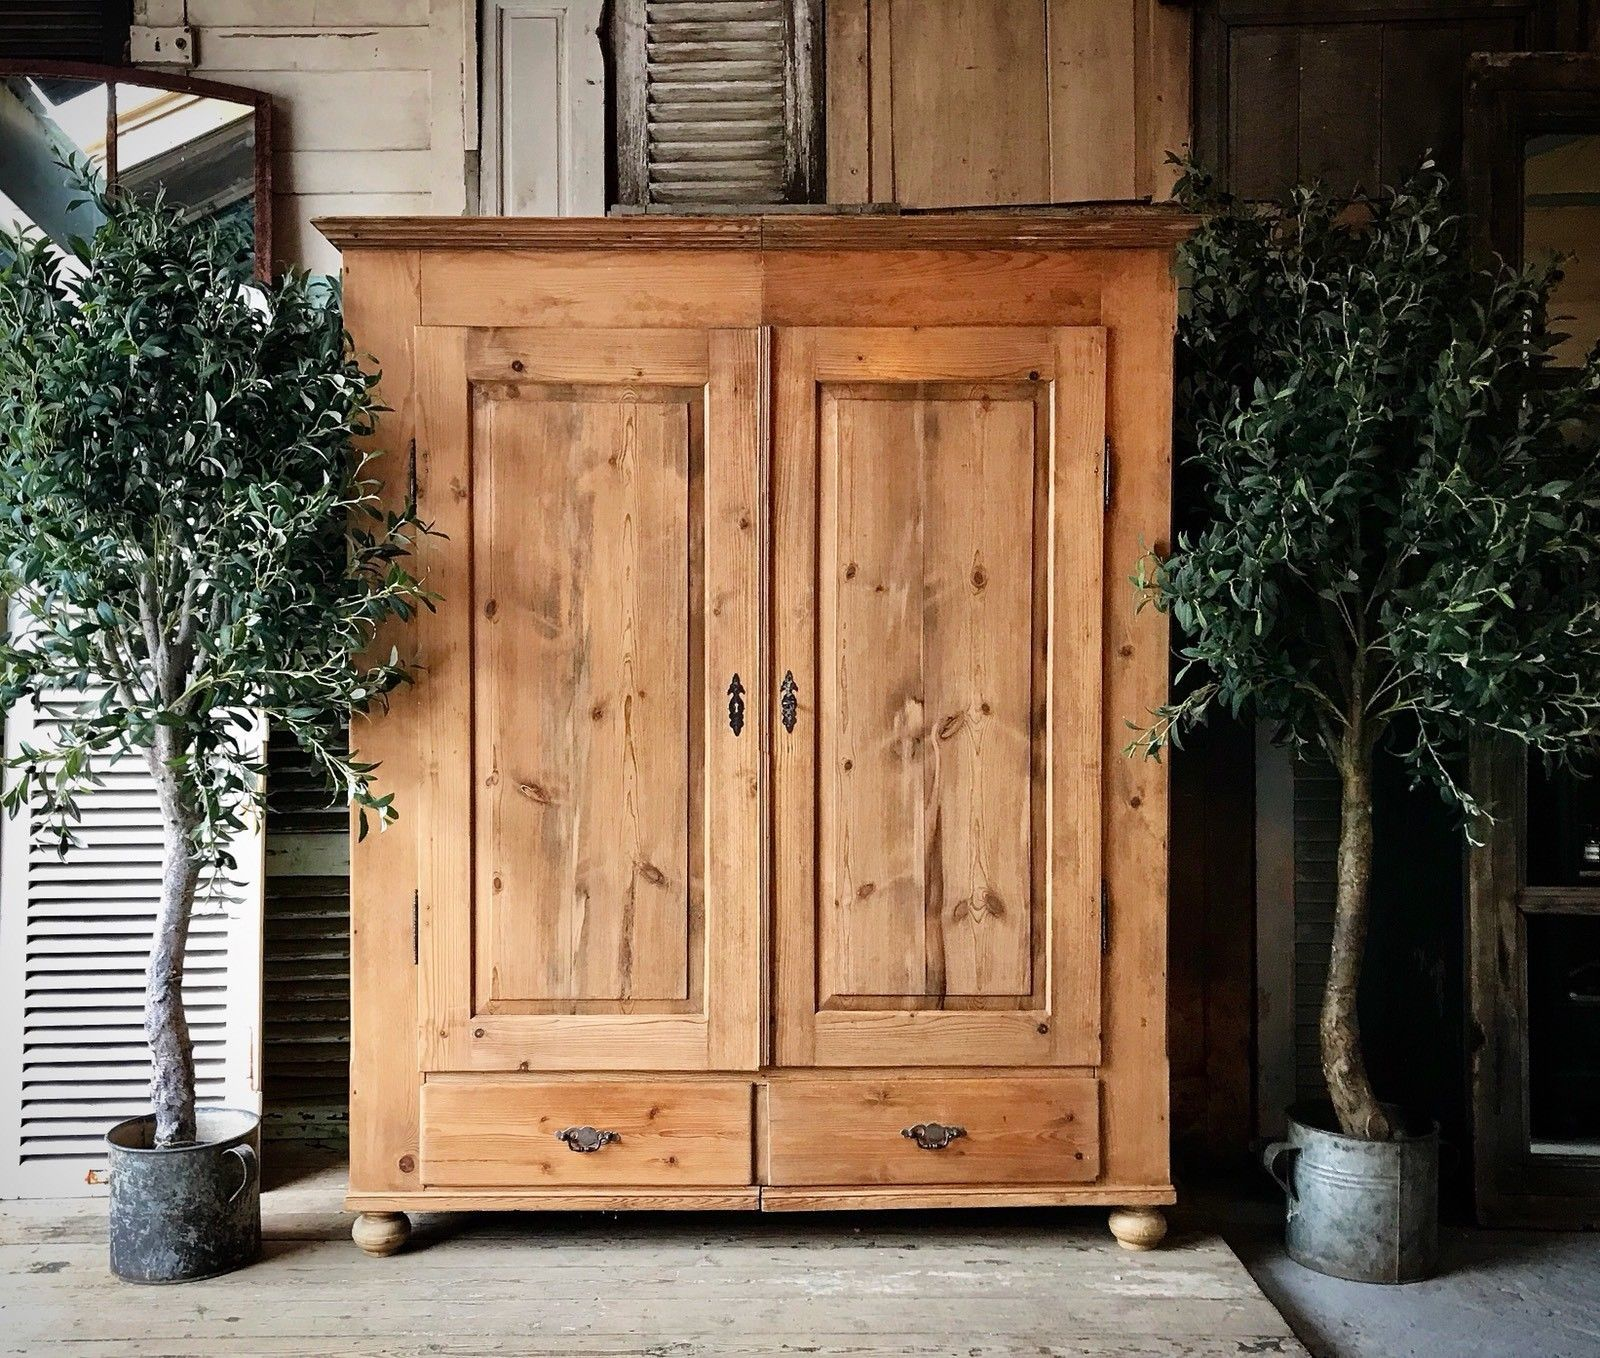 vintage-rustic-pine-wardrobe-4bfe6057-842e-403a-b647-88397c7d0572